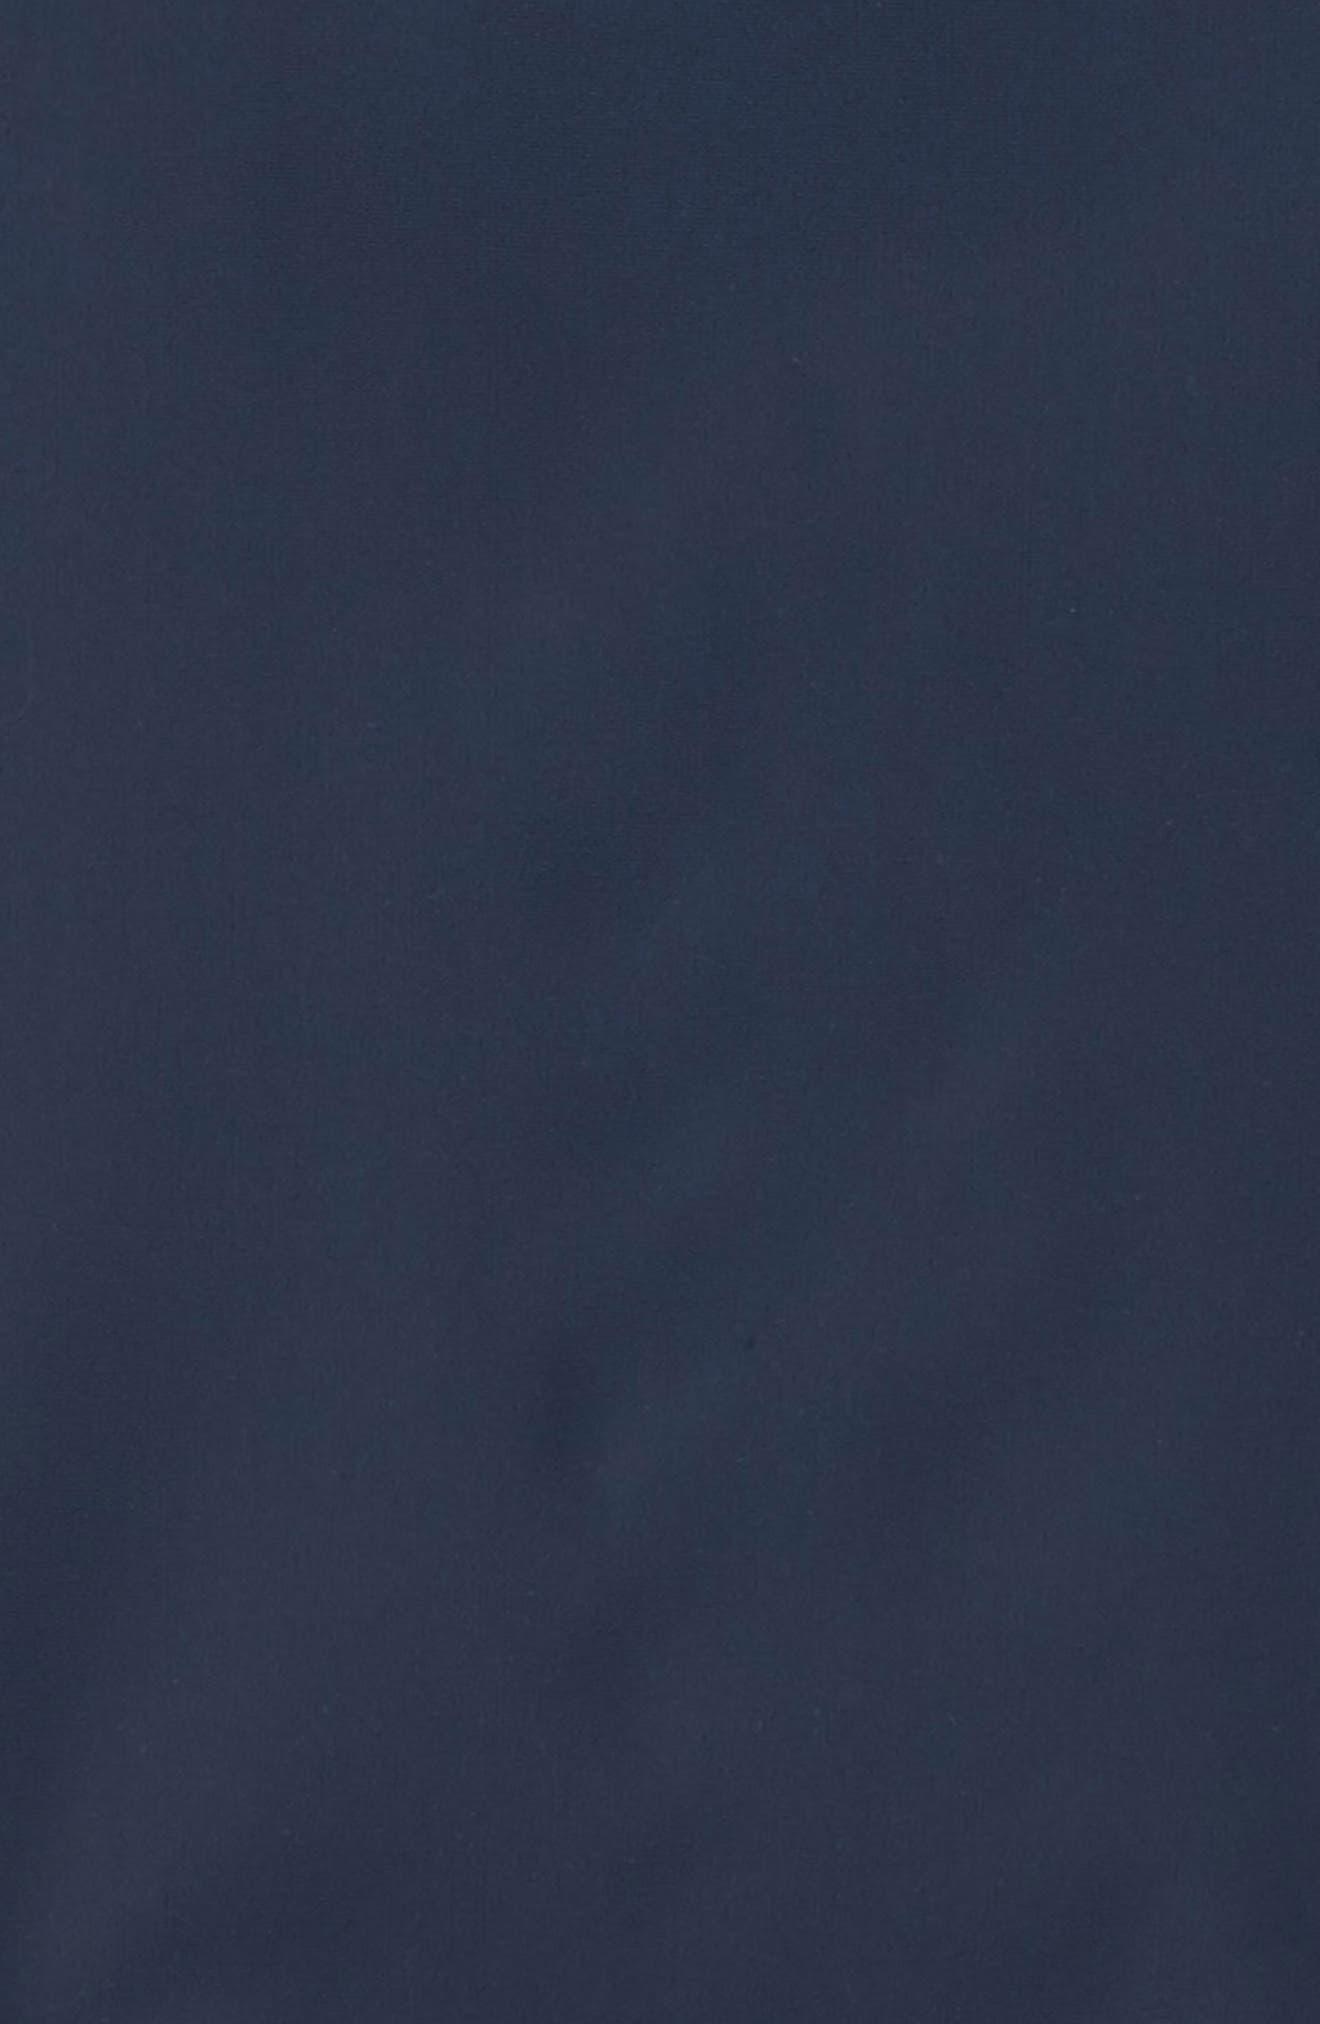 Raglan Long Sleeve Rashguard,                             Alternate thumbnail 2, color,                             411